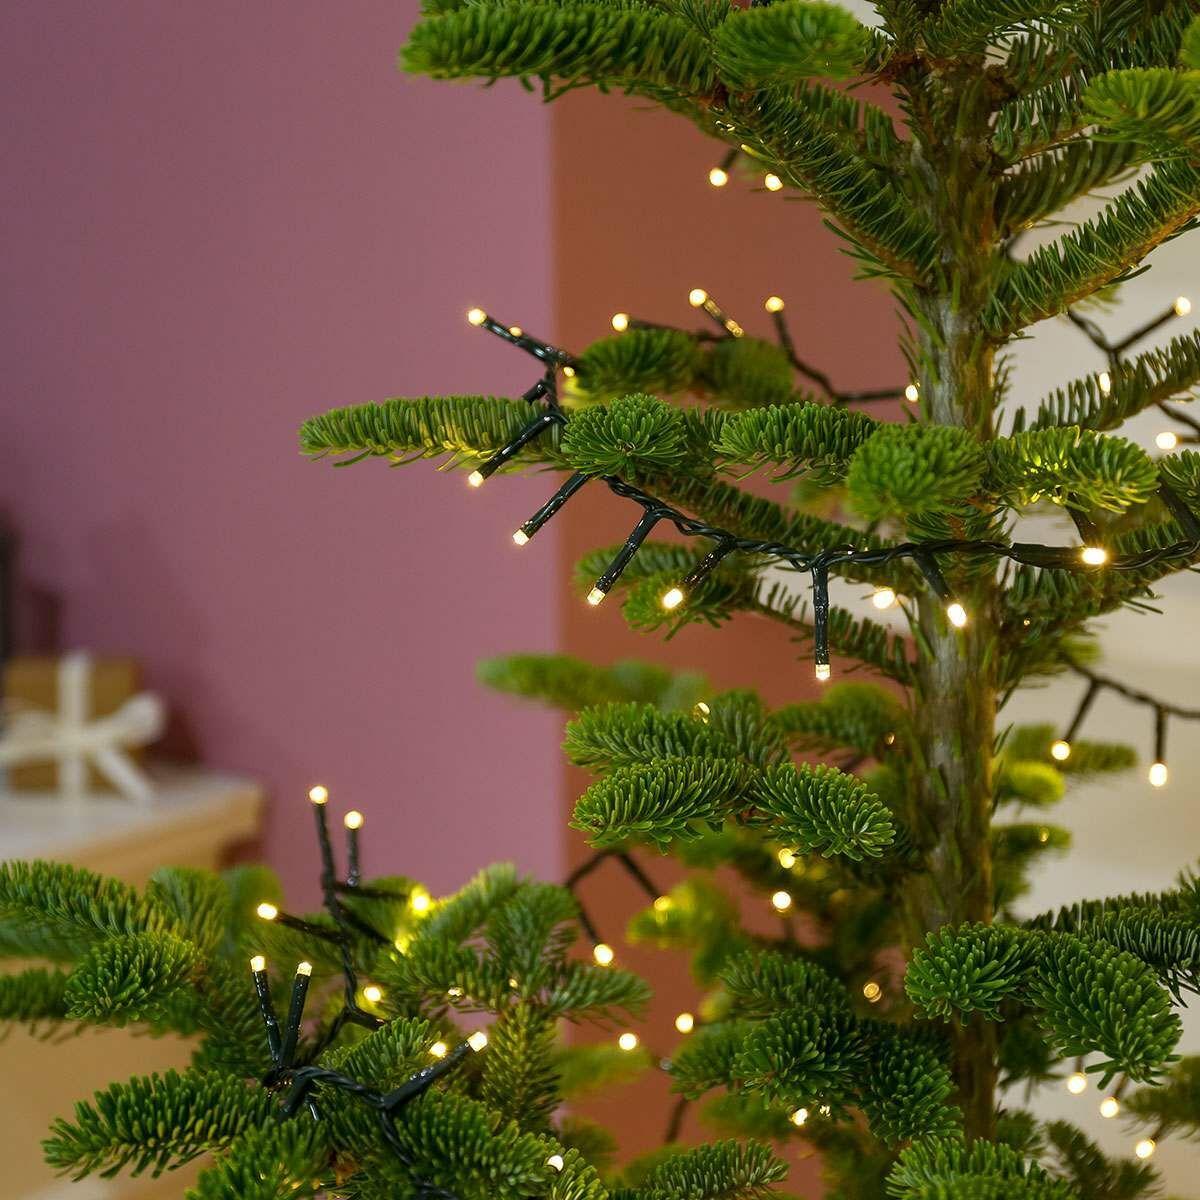 25m Christmas Tree Fairy Lights, 1000 Warm White LEDs